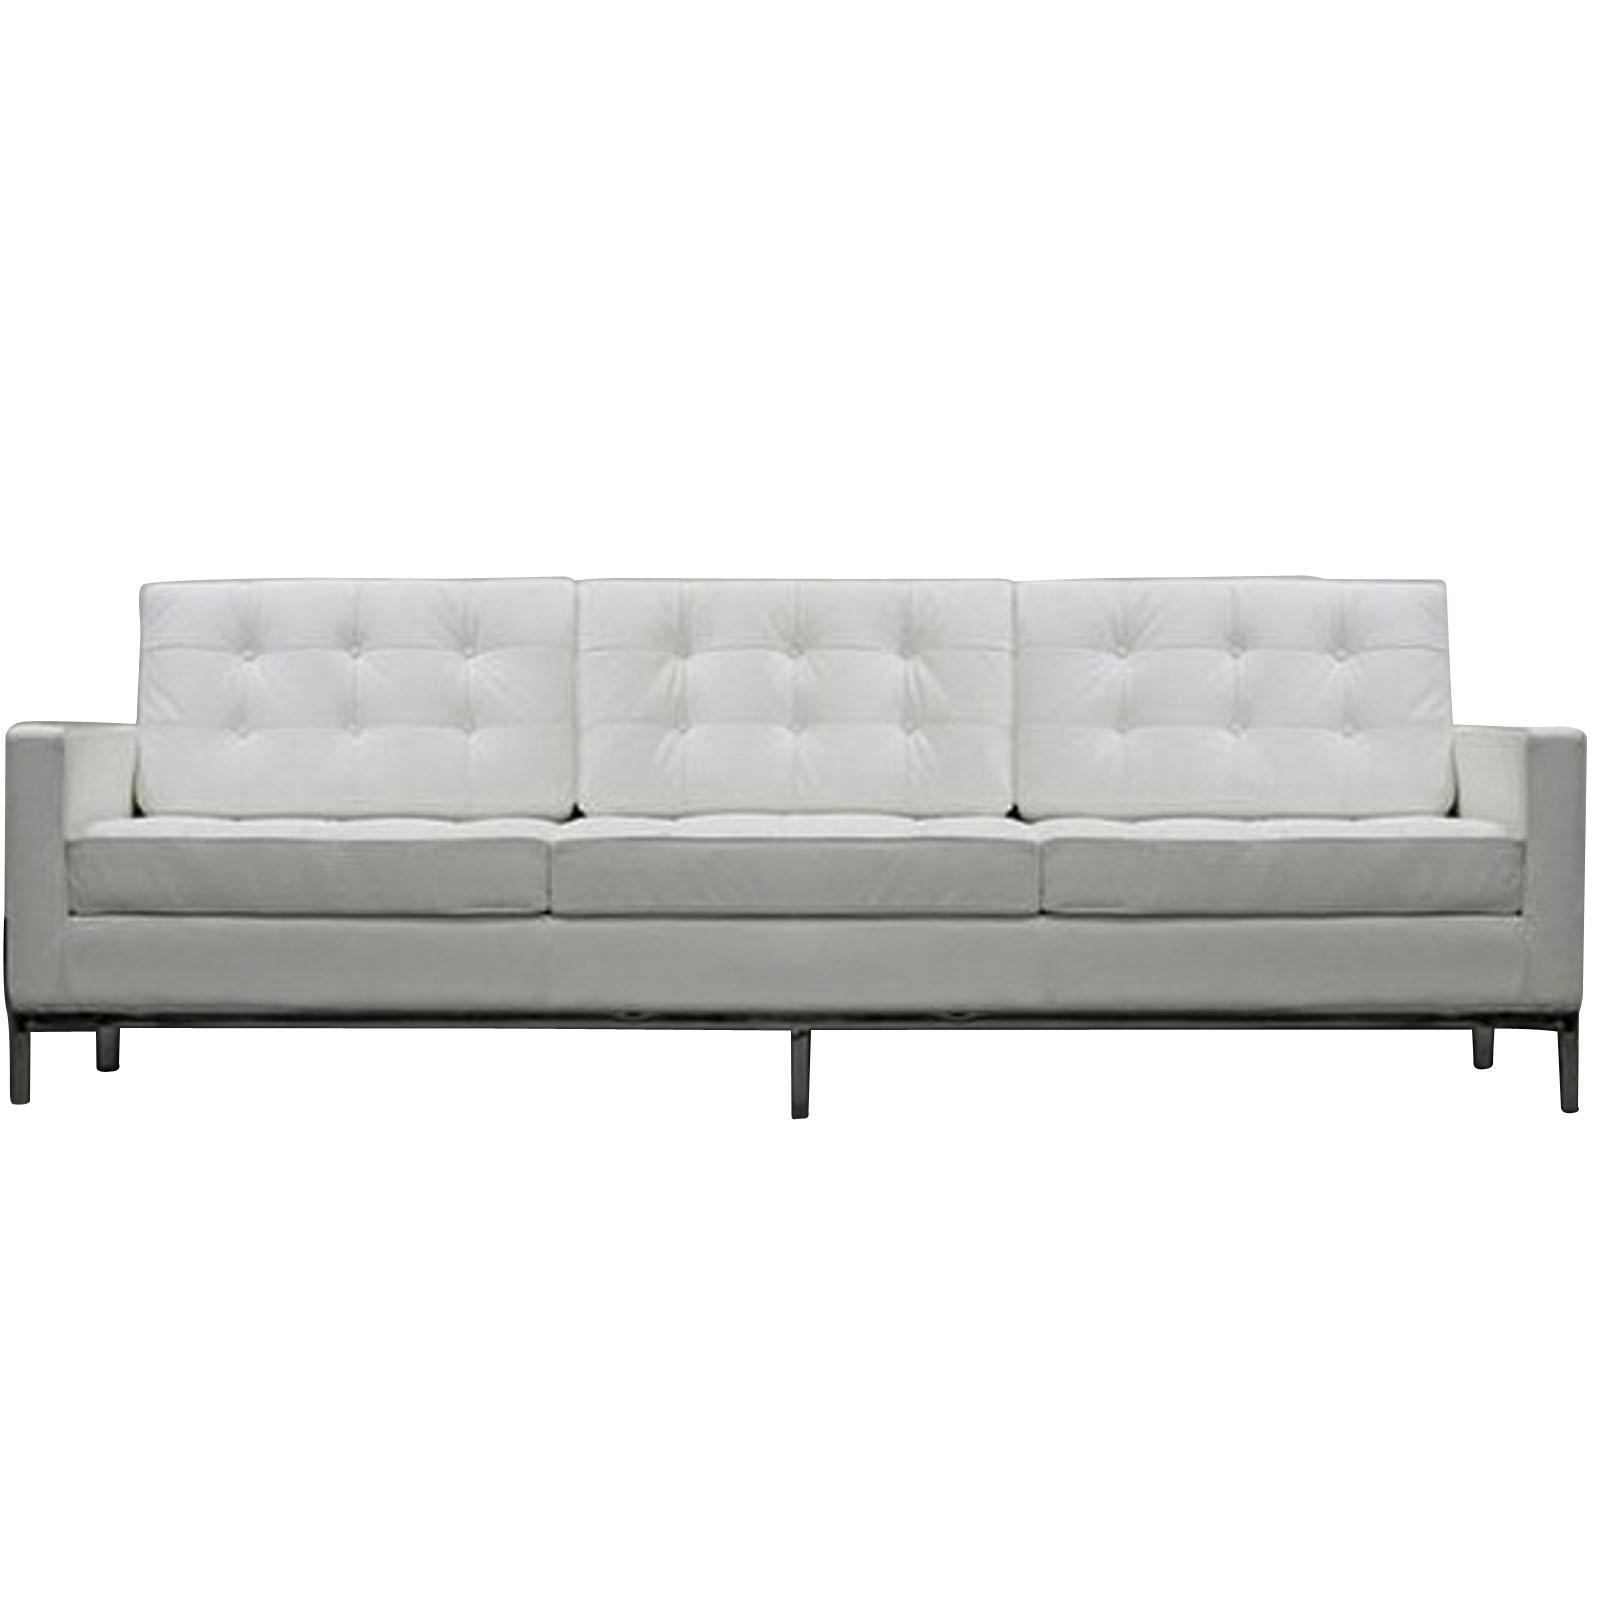 2018 Latest Florence Knoll Style Sofas Sofa Ideas